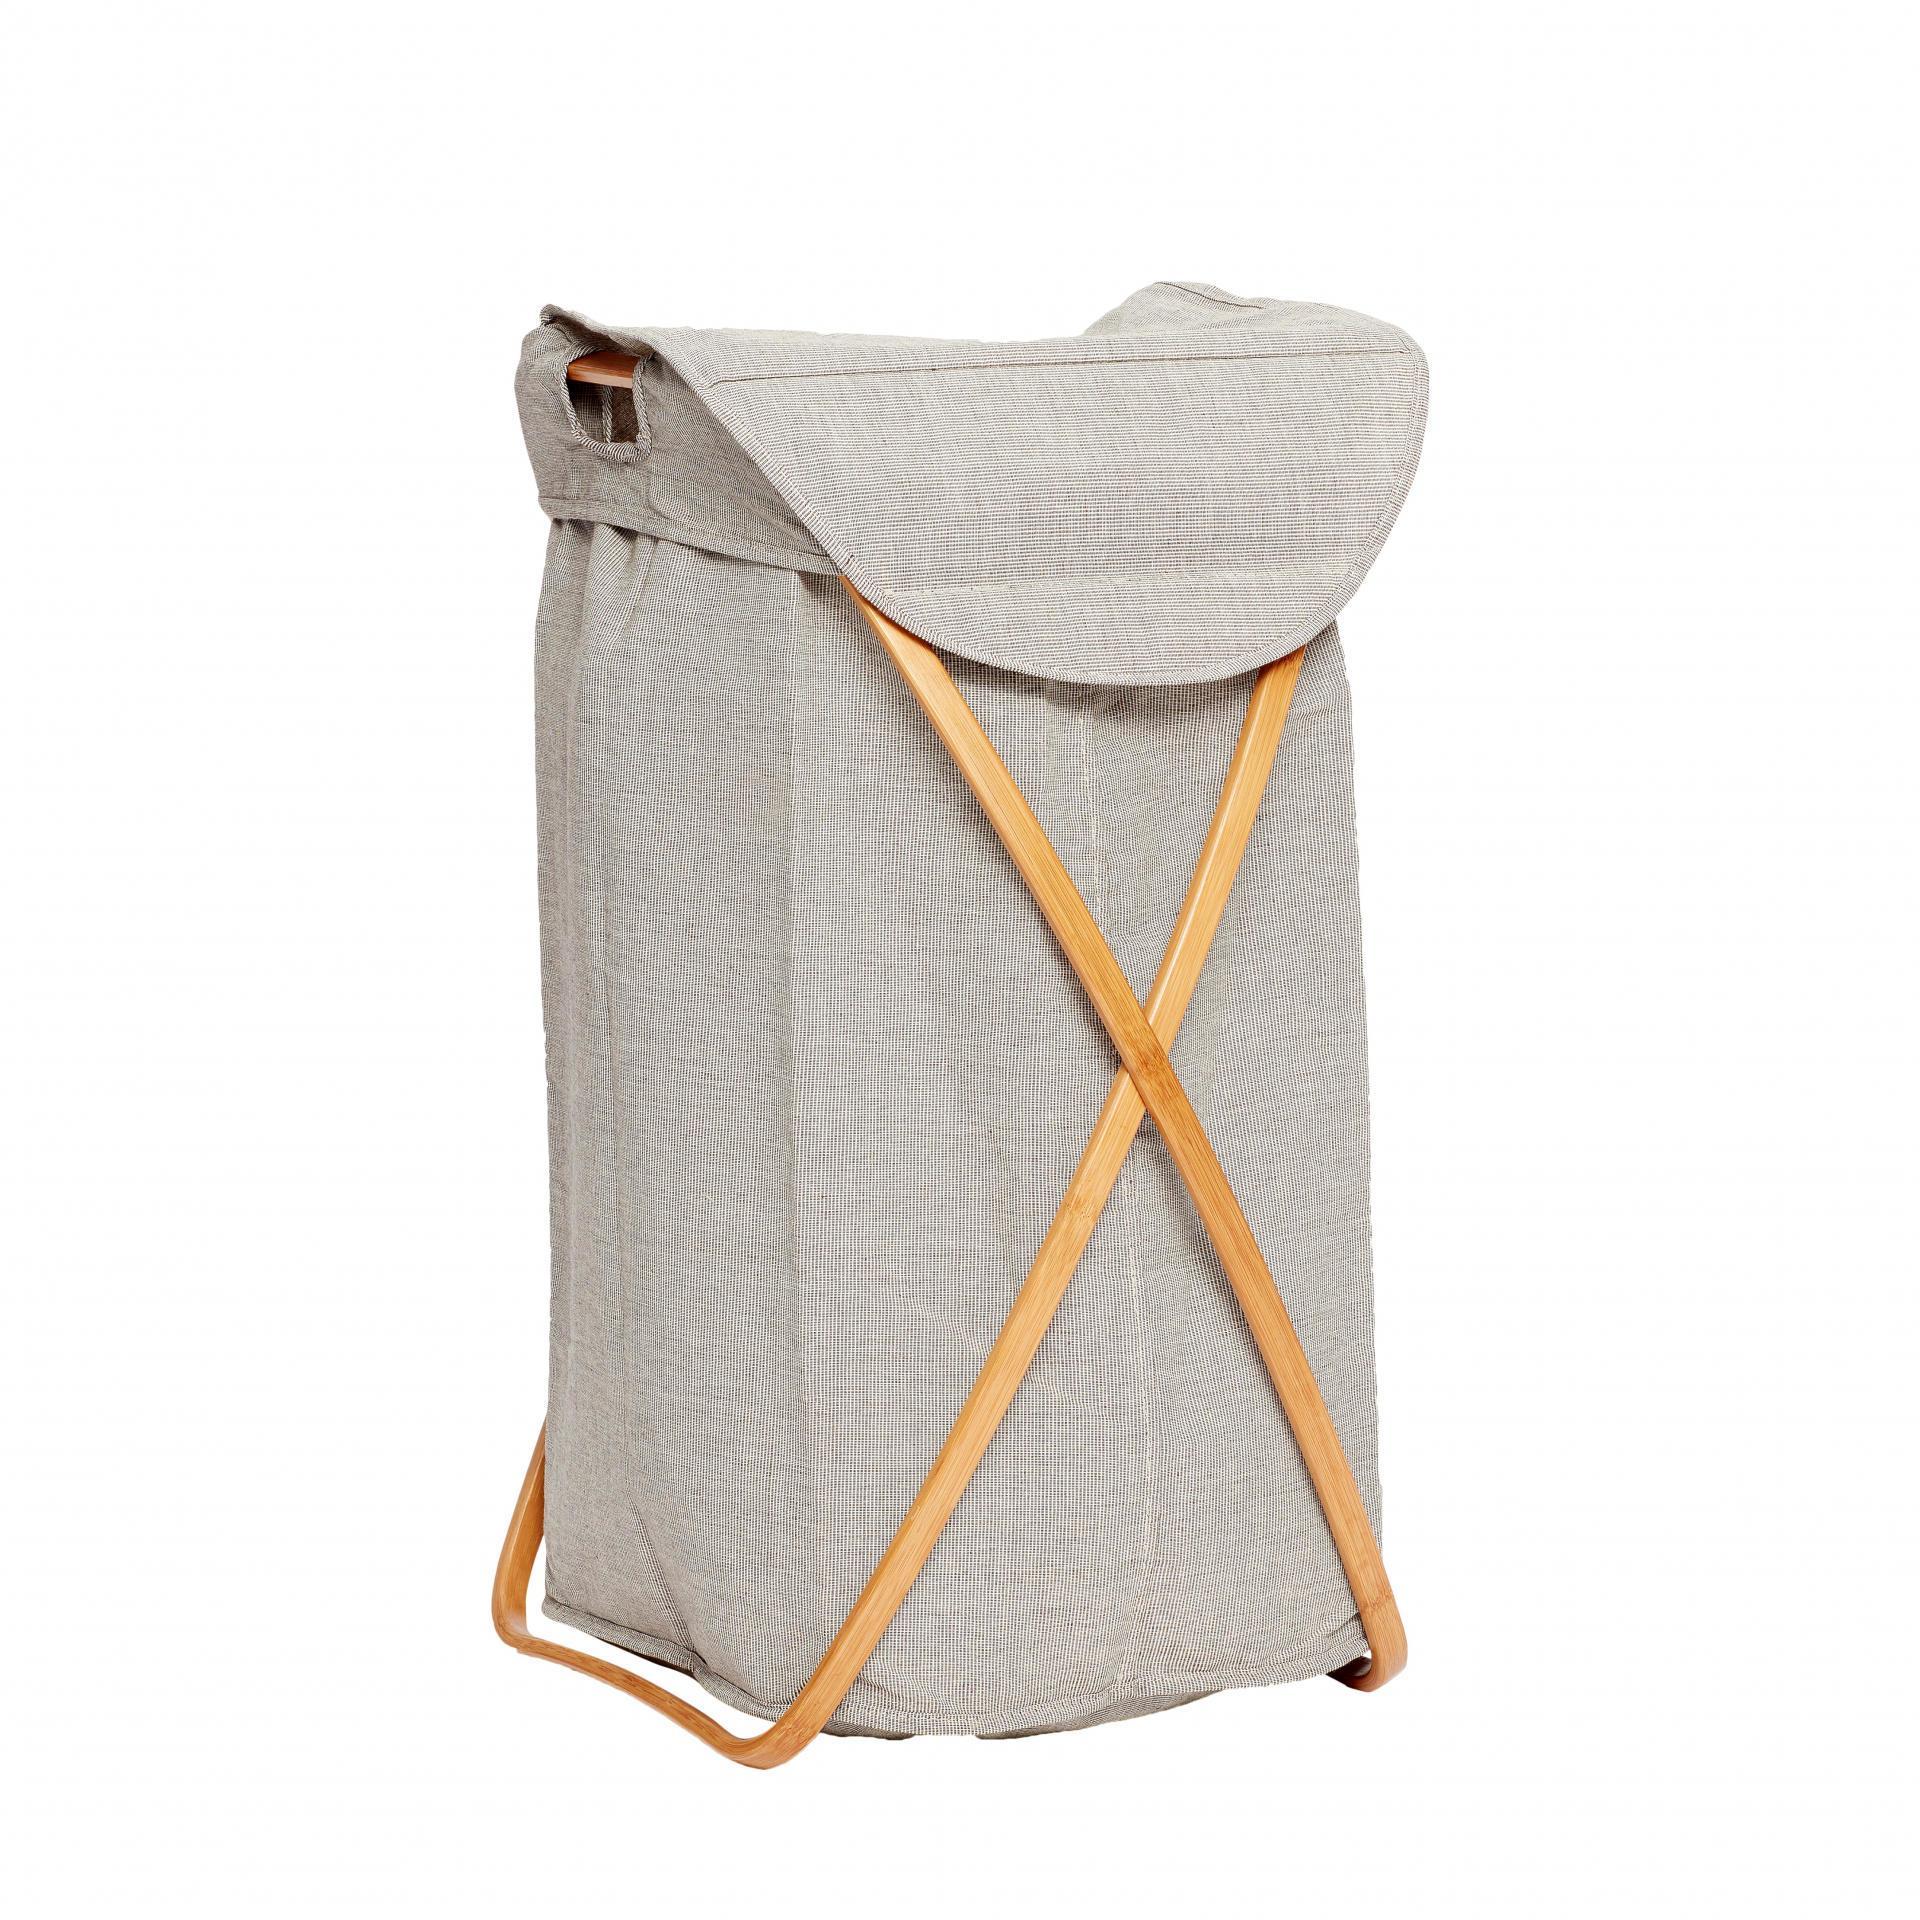 Hübsch Koš na prádlo Bamboo frame, šedá barva, dřevo, textil